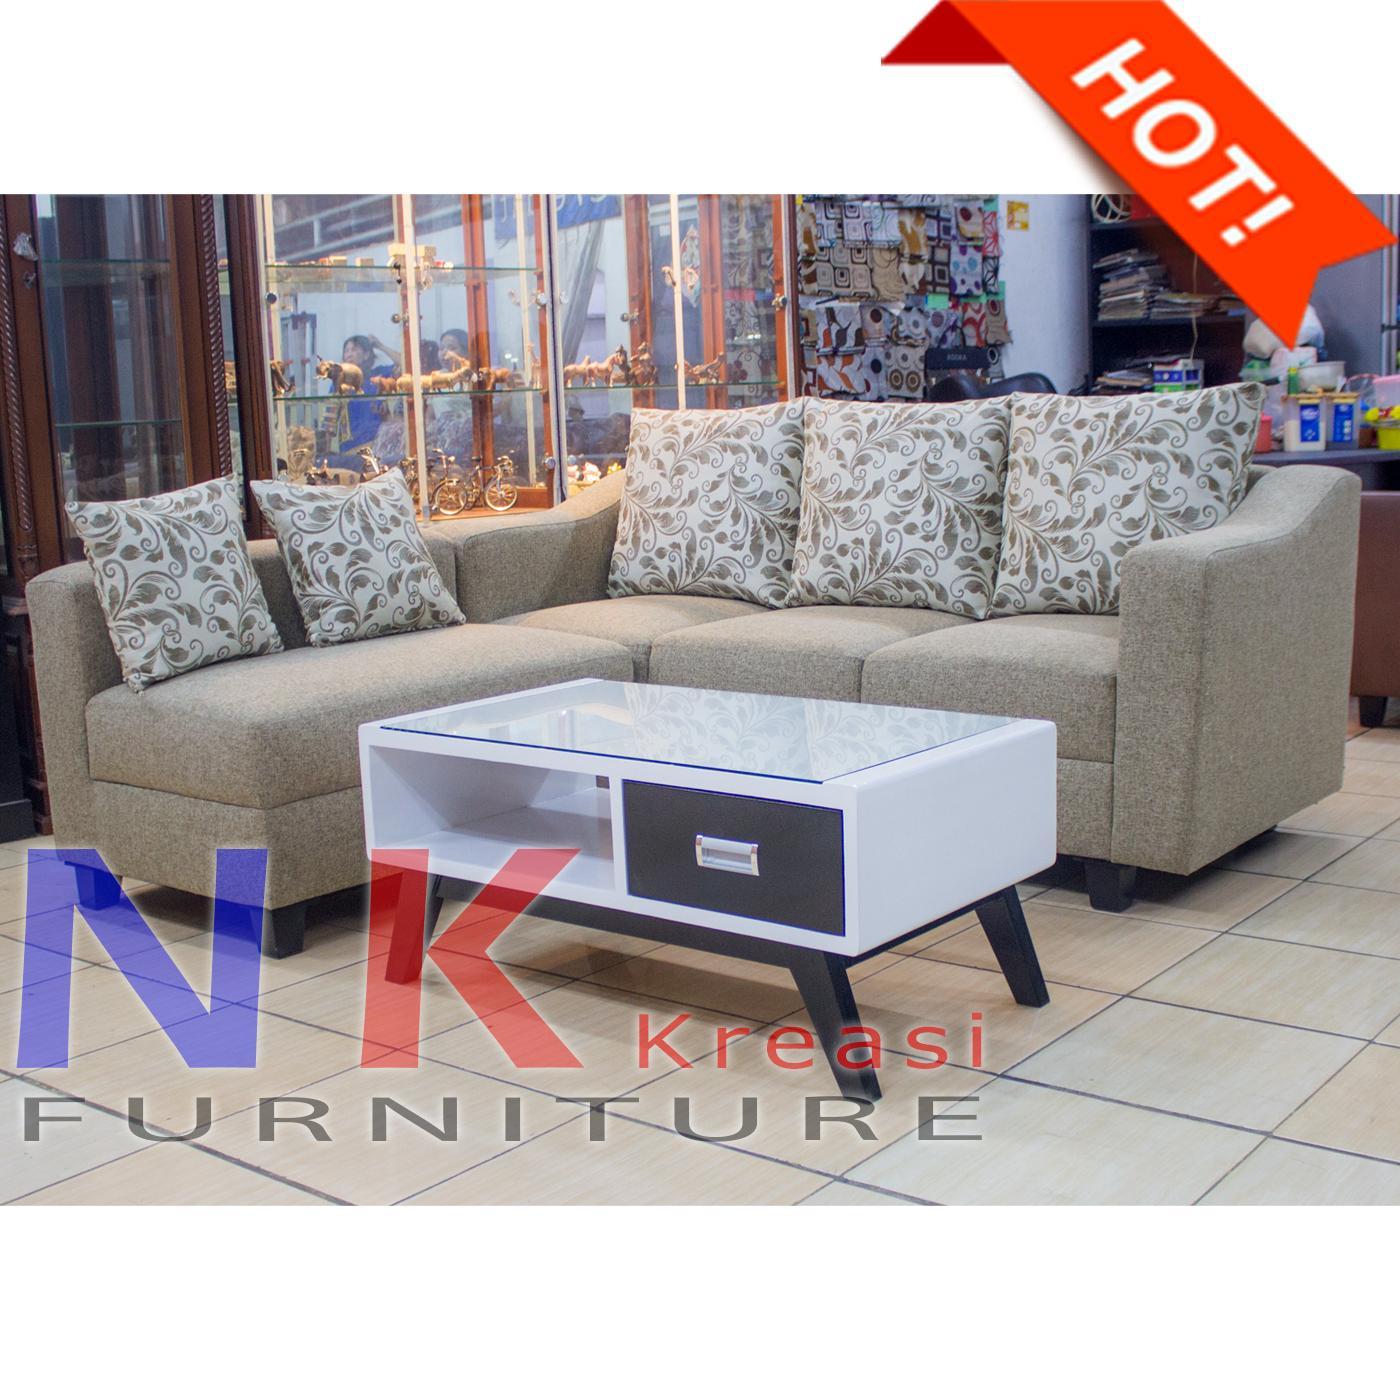 Sofa Kursi Ruang Tamu L sudut ELEGAN Minimalis mewah + MEJA CANTIK n- JABODETABEK ONLY